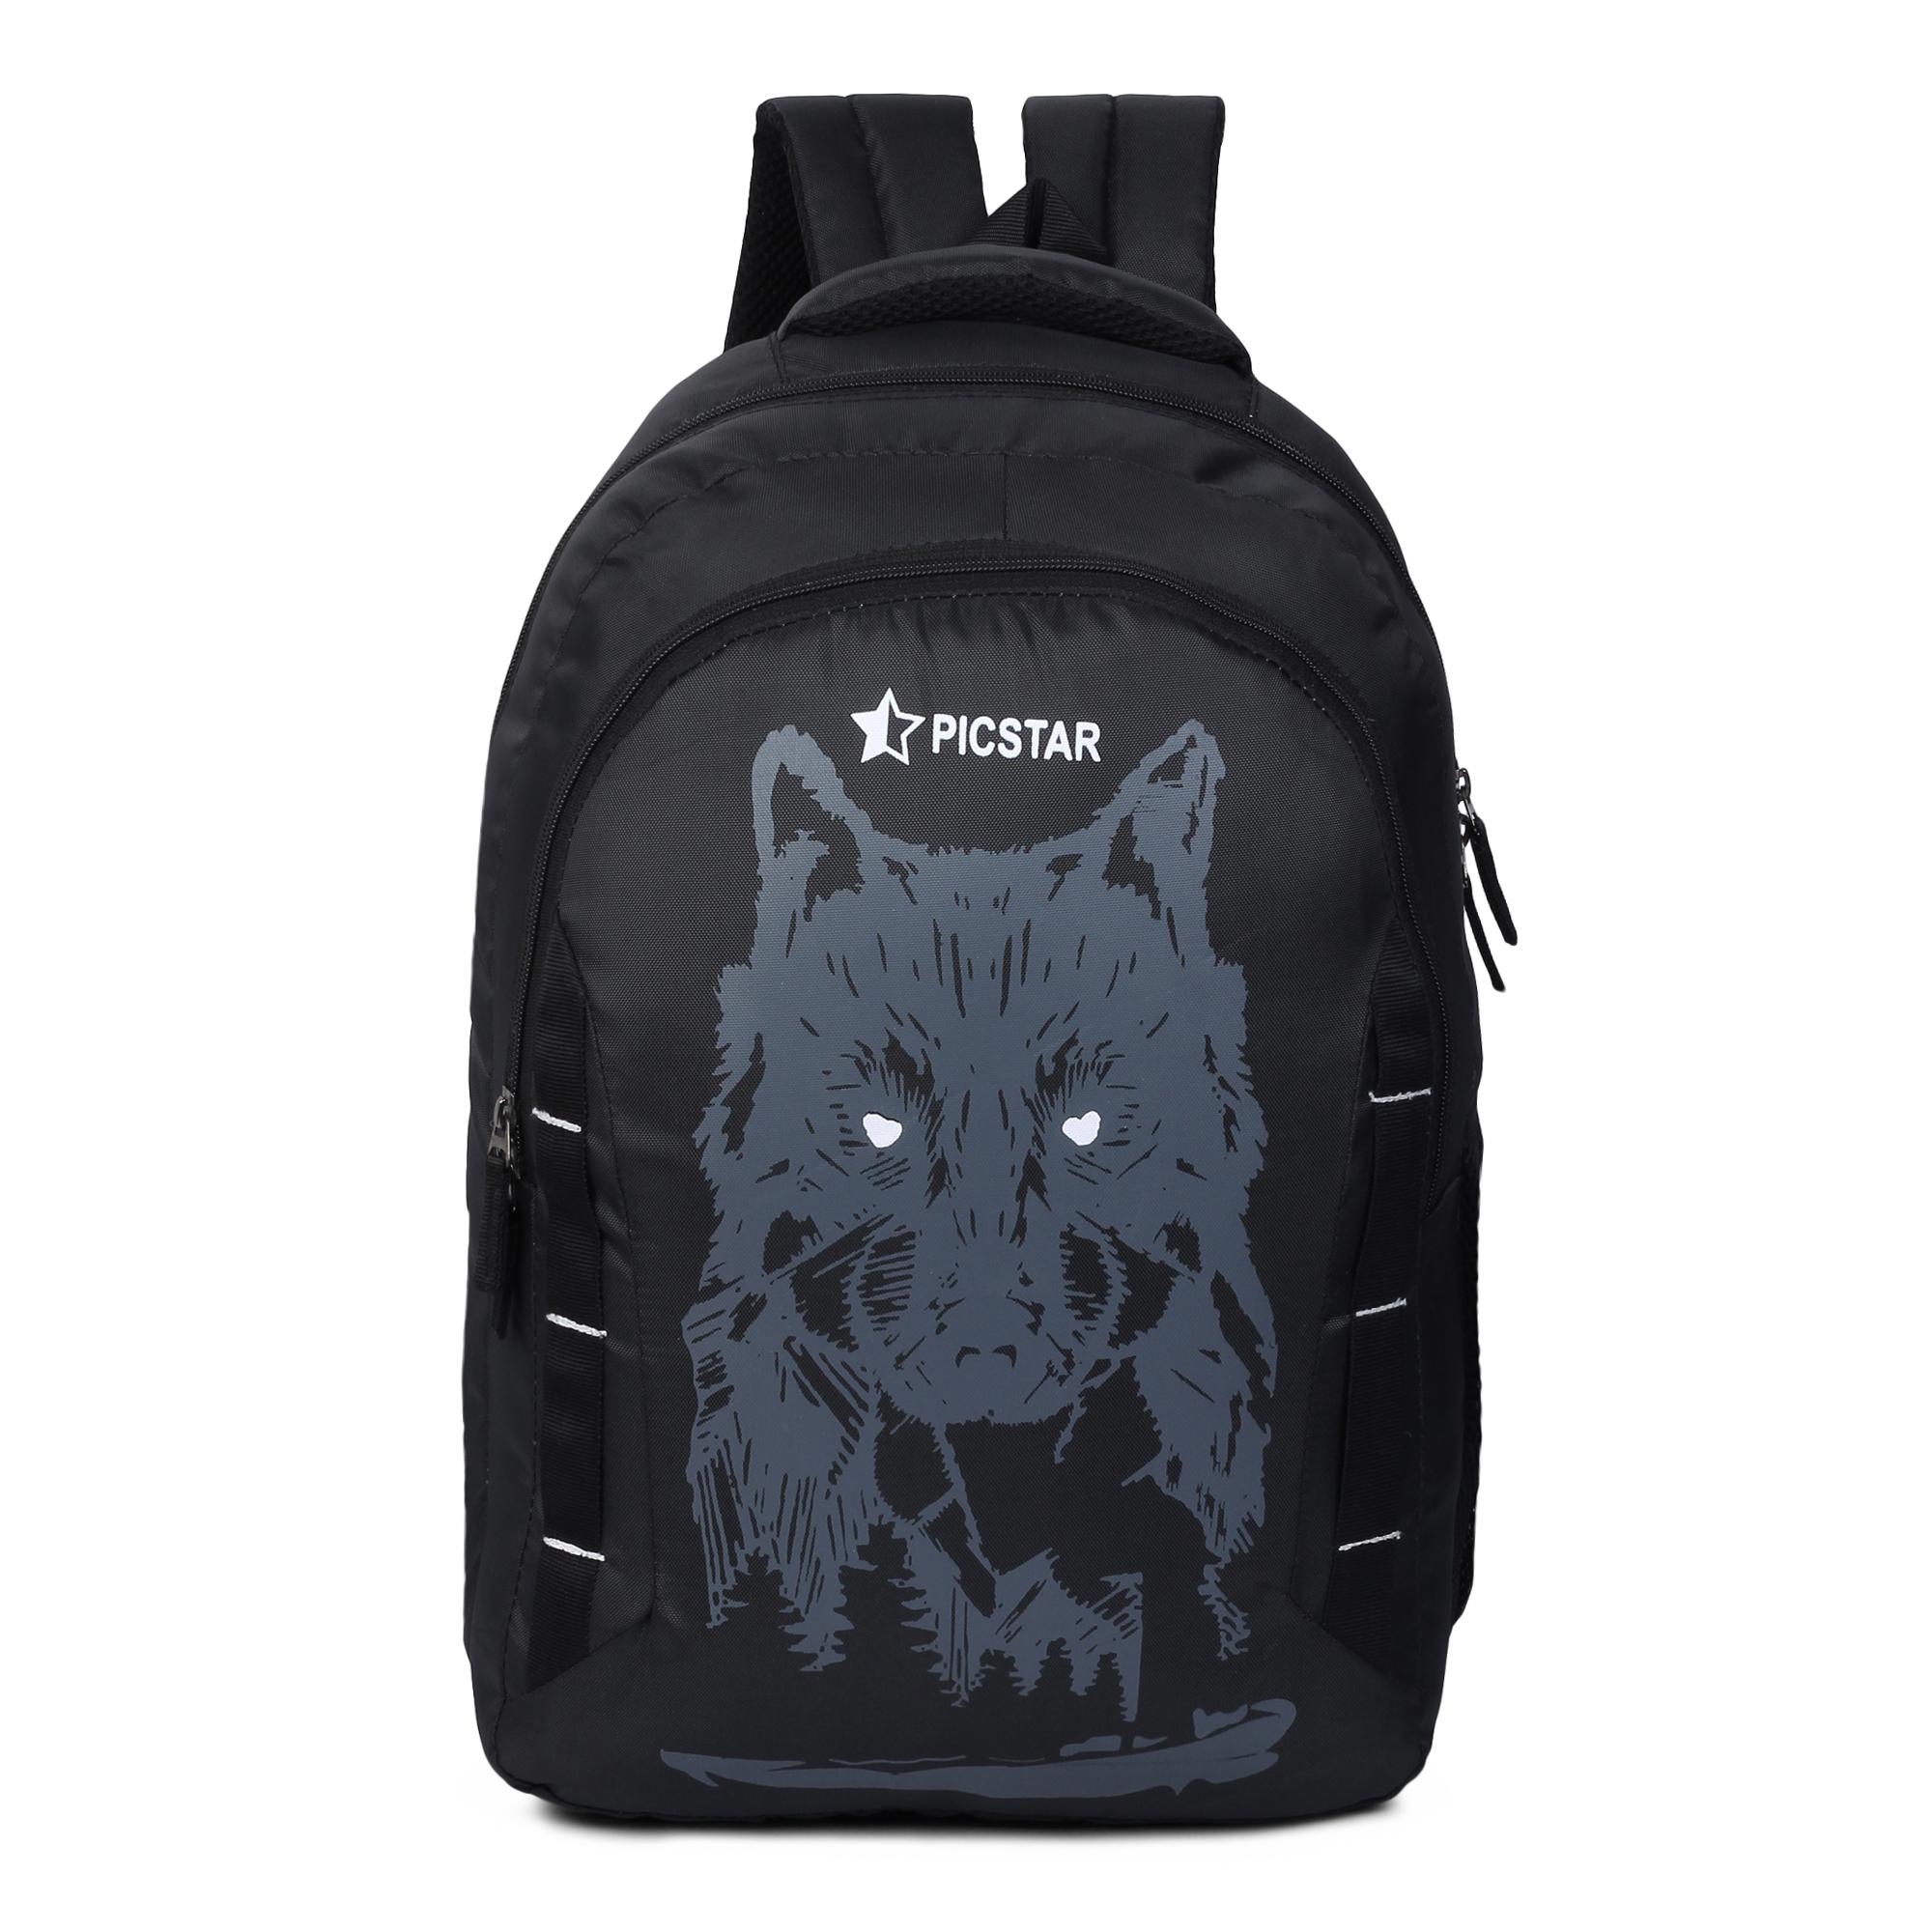 Picstar | Picstar Daredevil 35 L Black Backpack for Men and Women|Unisex Backpack|College Bag for Boys and Girls|office Backpack |School Bag|Trendy Backpack|Stylish Backpack